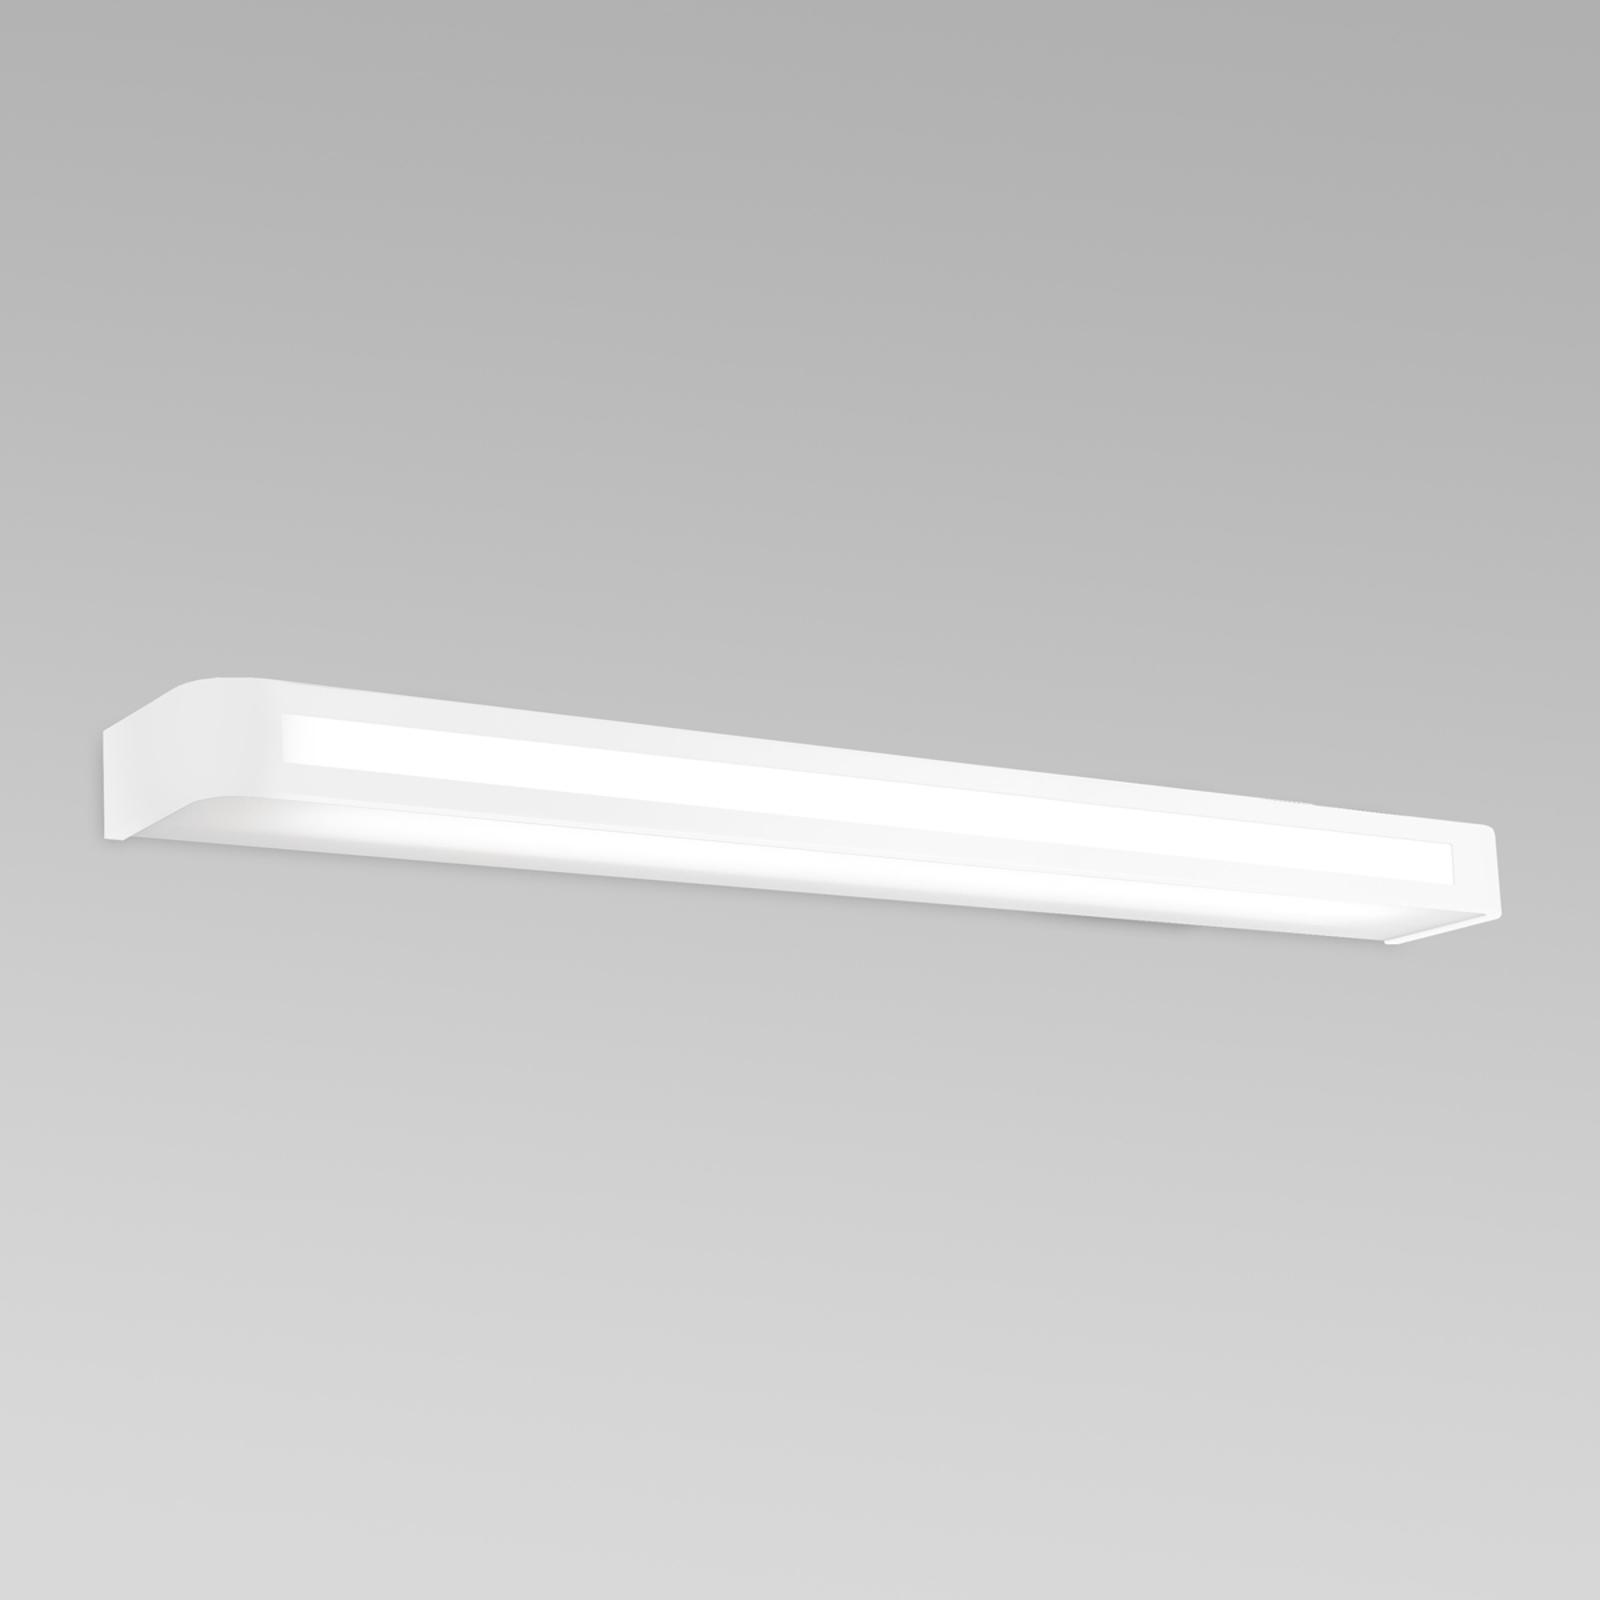 Acquista Intramontabile applique LED Arcos